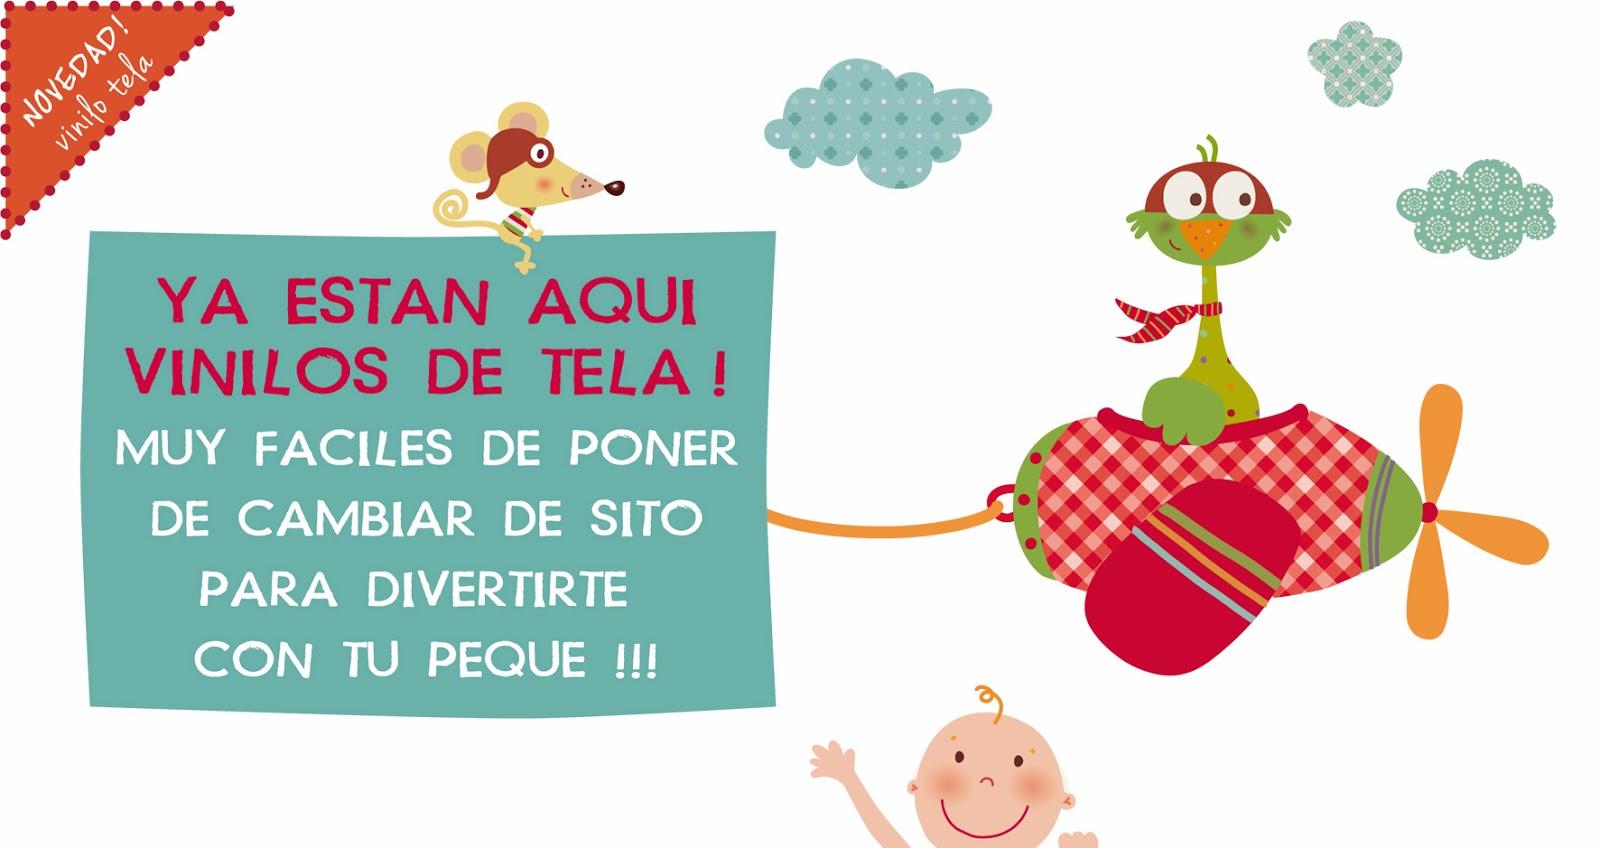 Vinilos infantiles noviembre 2013 - Vinilos de tela ...